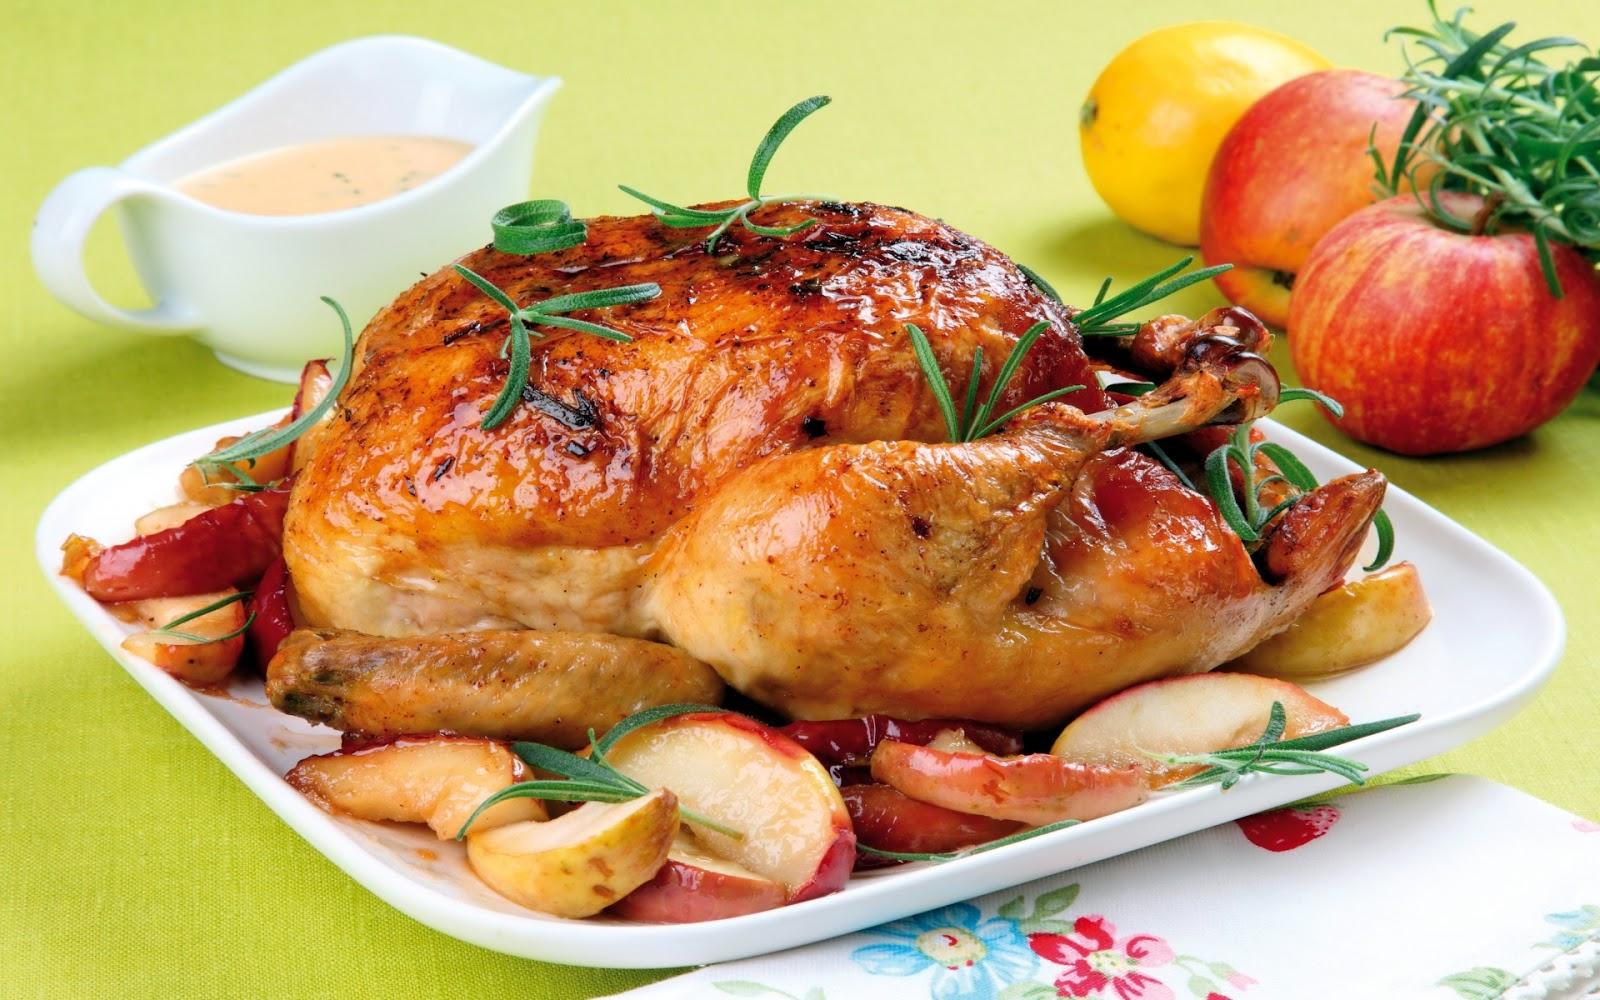 ap literature delicious cuisine Compassion over killing | coknet easy vegan recipes • 1 easy vegan recipes delicious, nutritious, compassionate cuisine vegrecipesorg free.